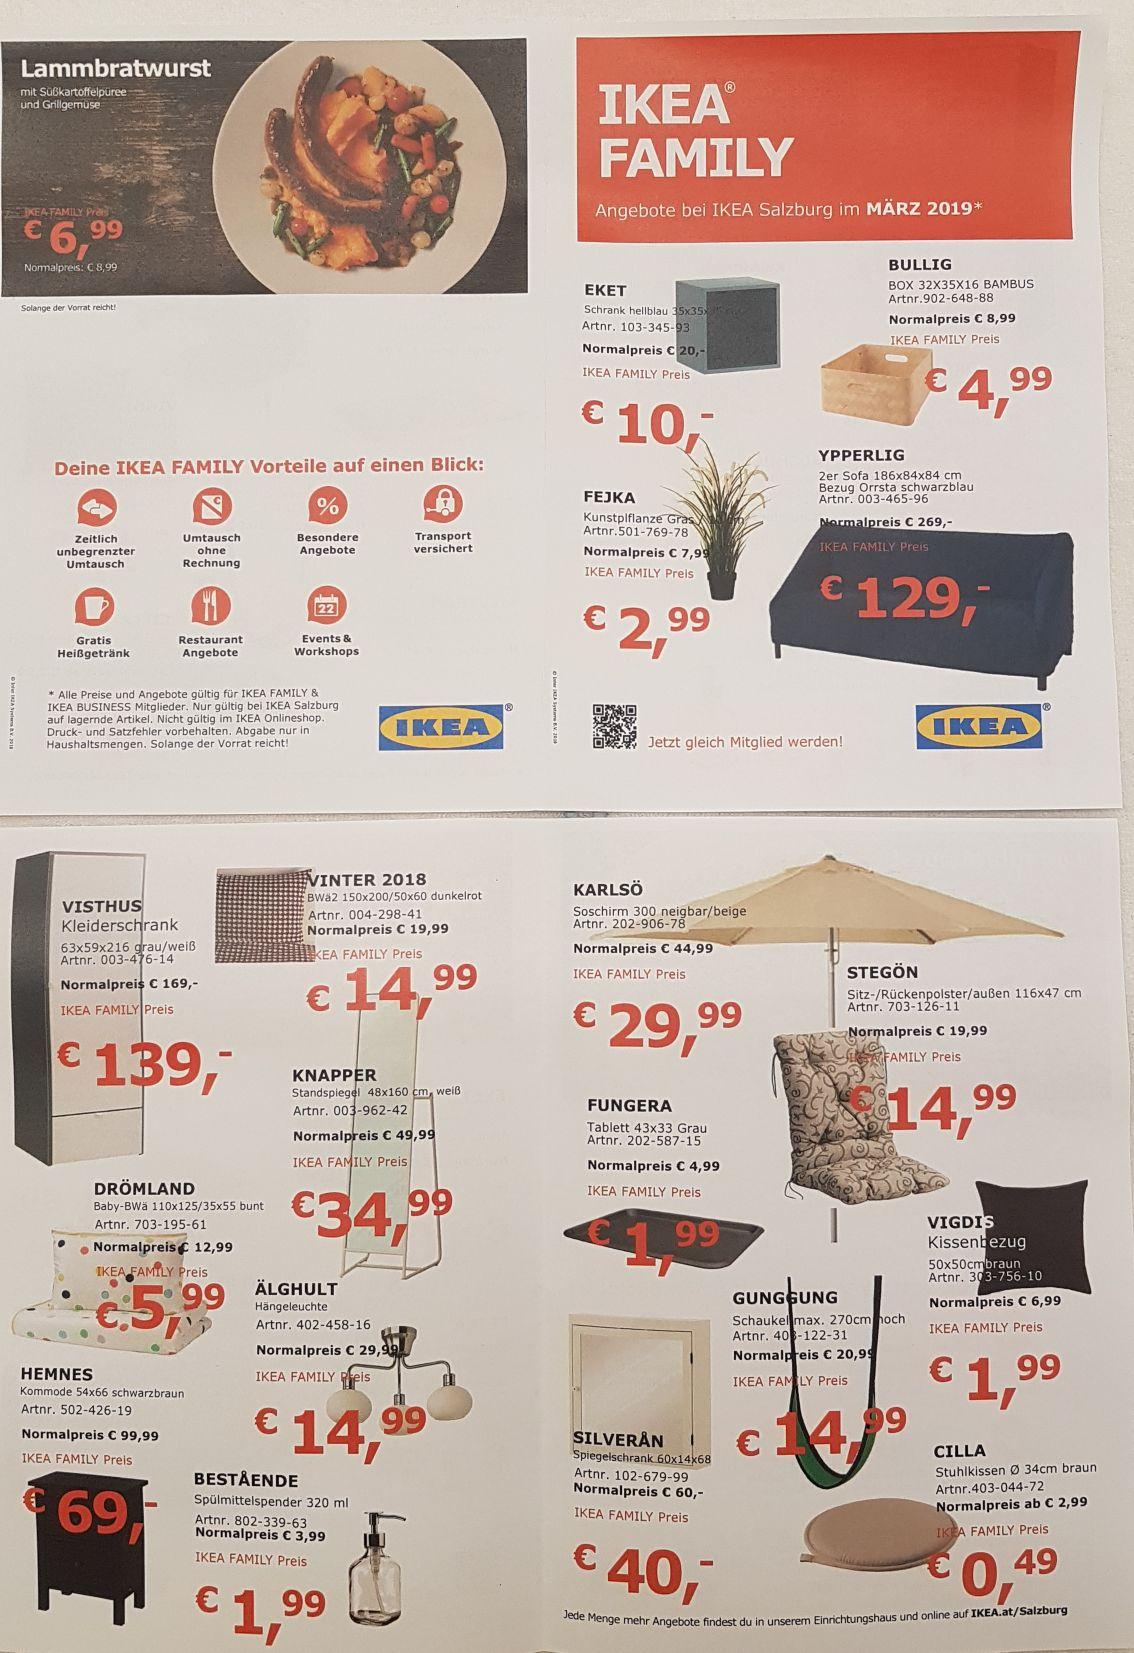 Family Angebote bei Ikea Salzburg